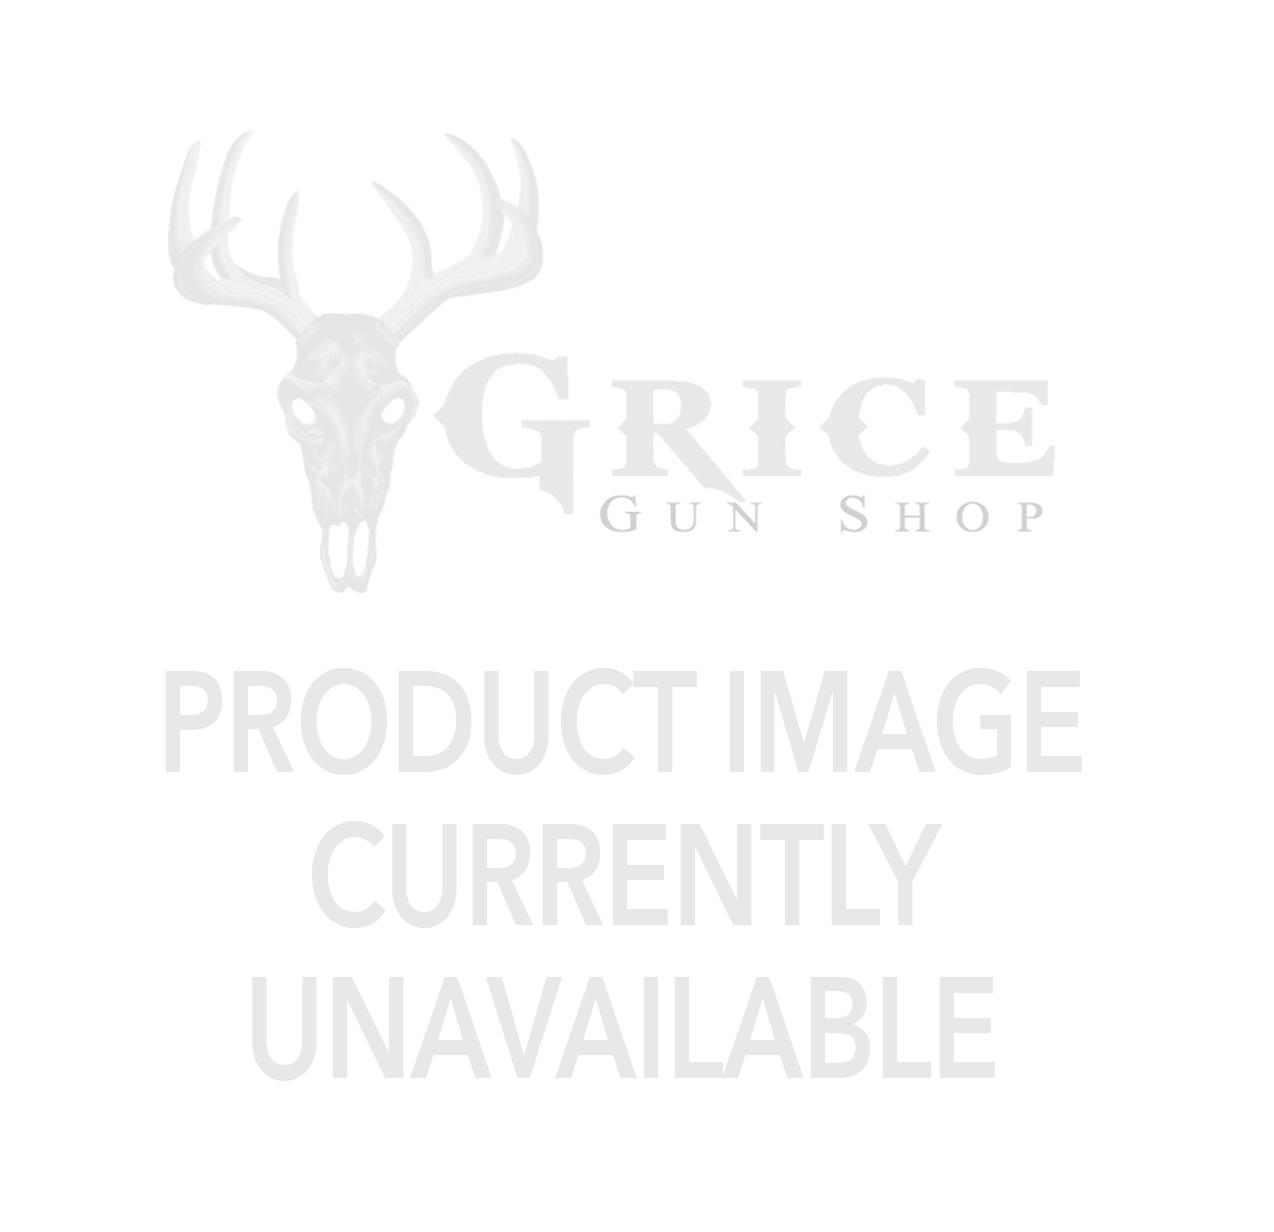 CrimsonTrace - LaserGrips-S&W M&P SD9/SD40/SD9VE/SD40VE